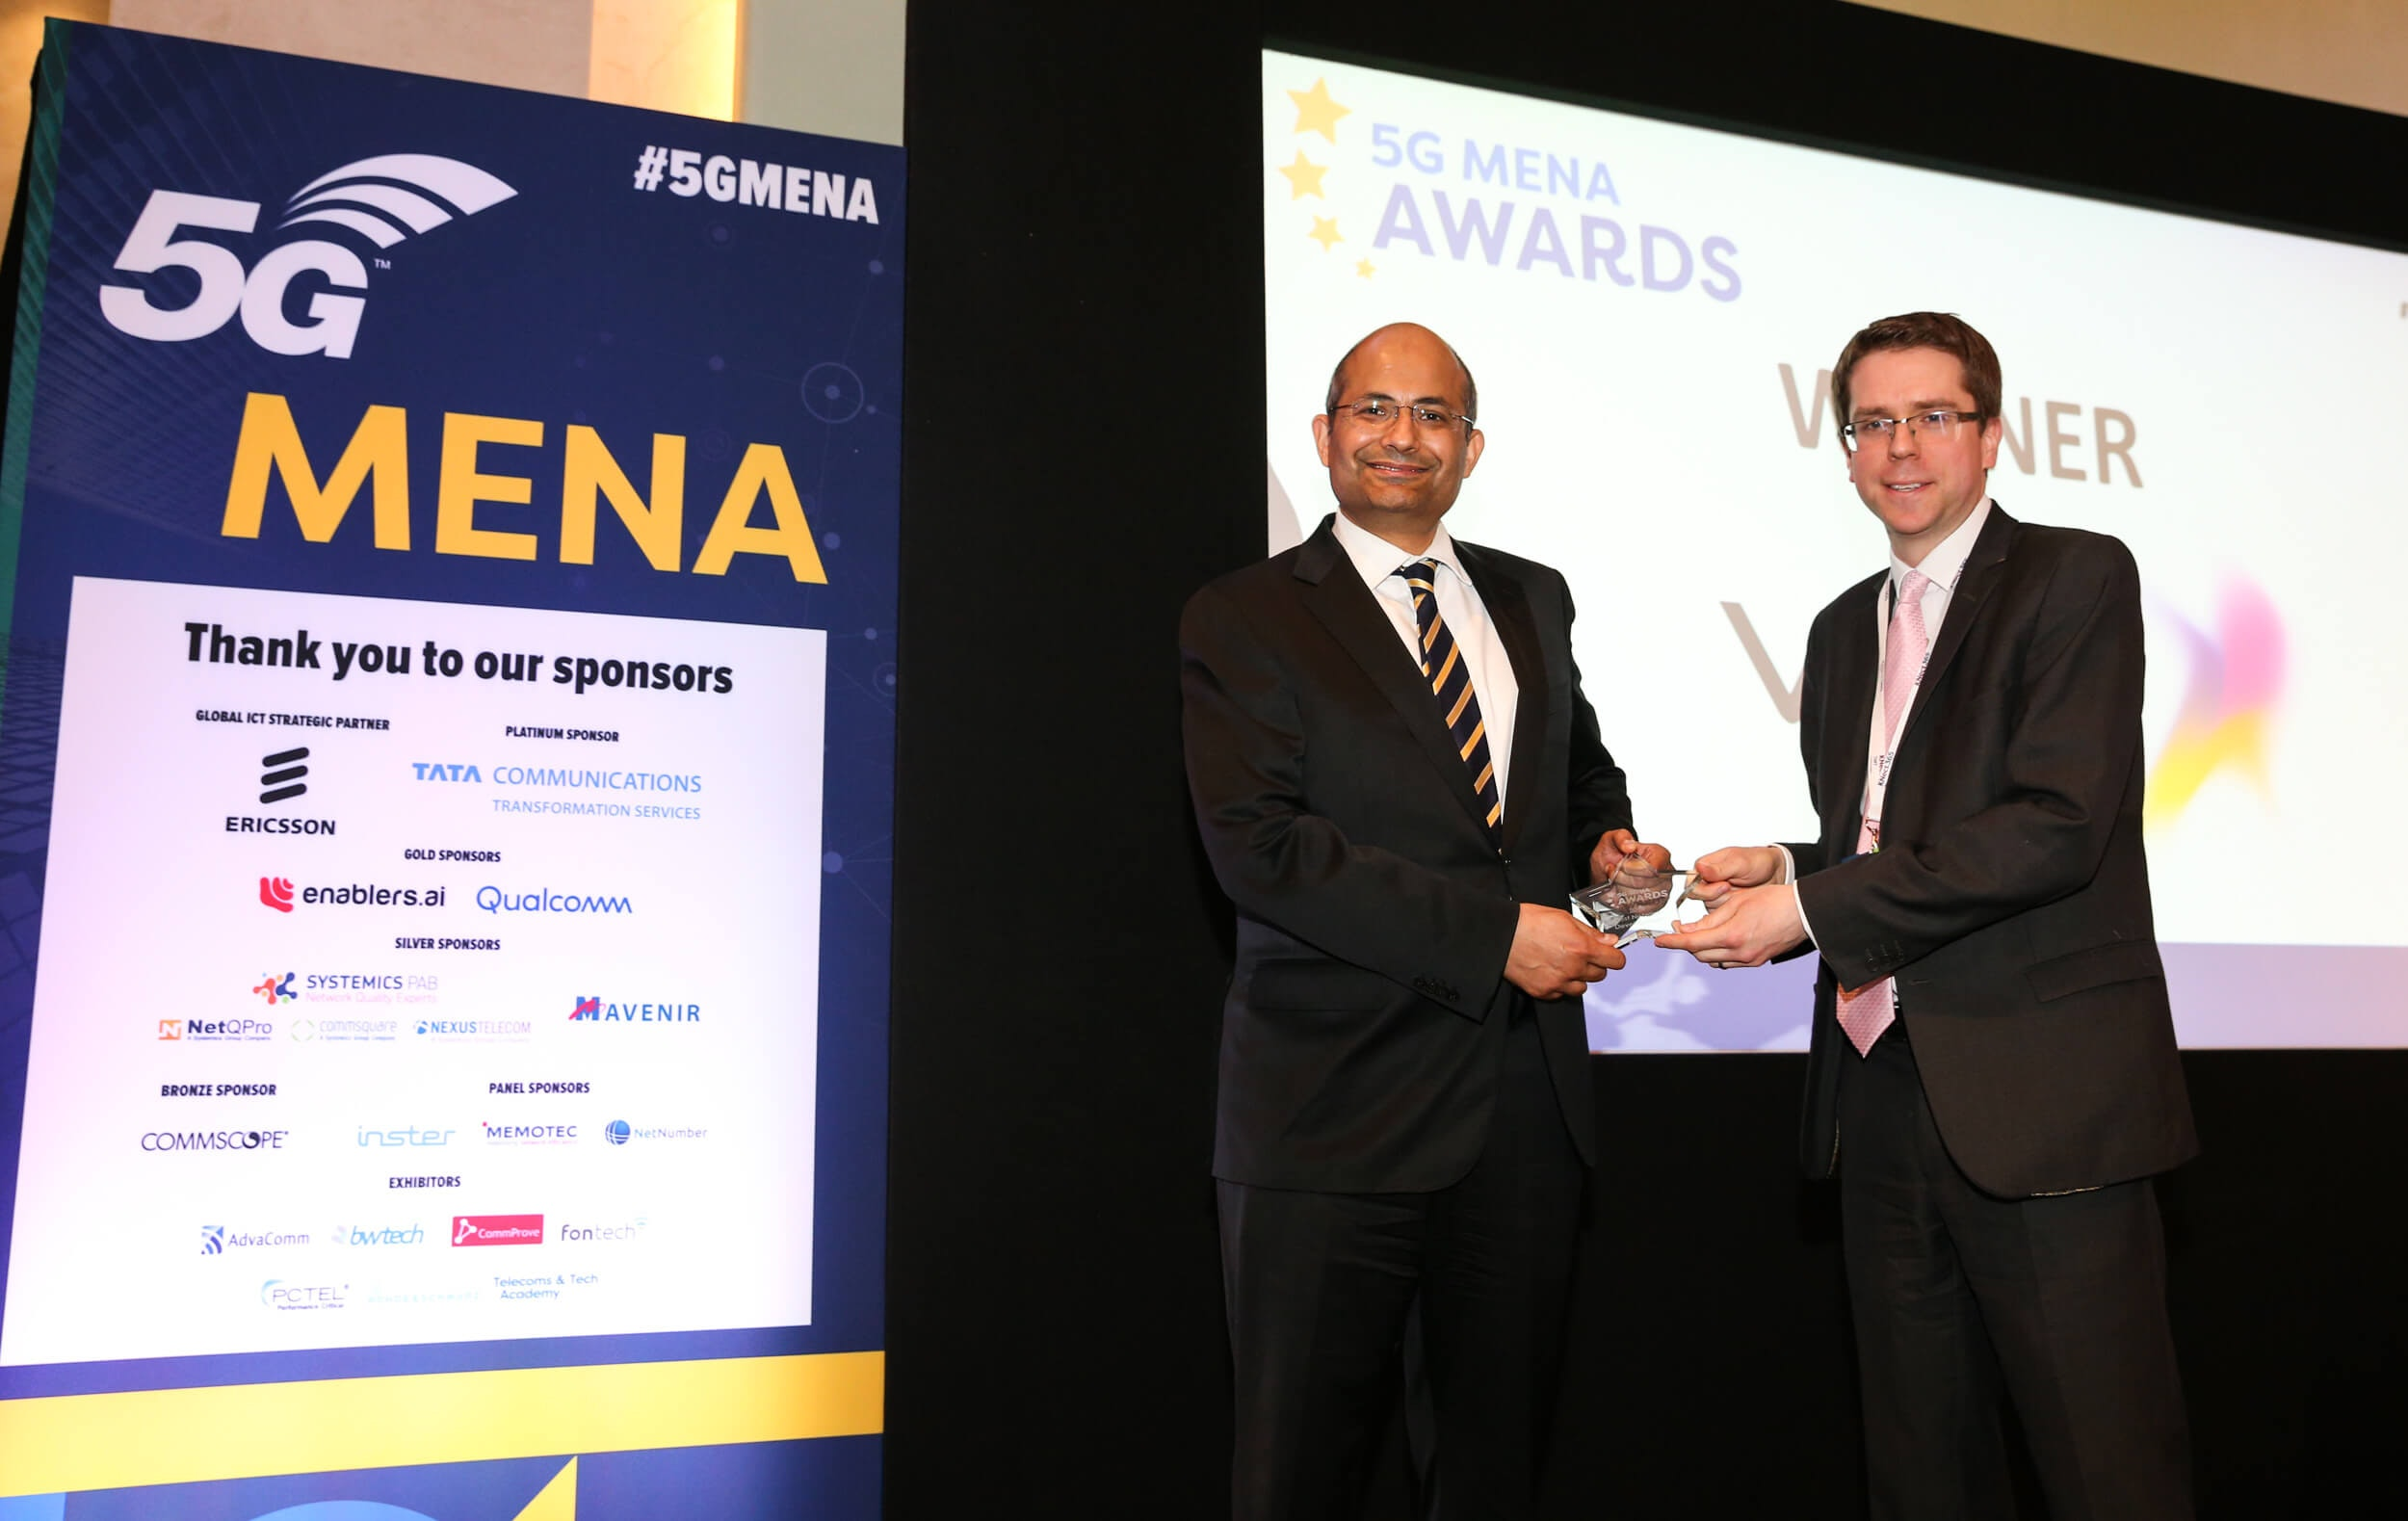 5G MENA Awards